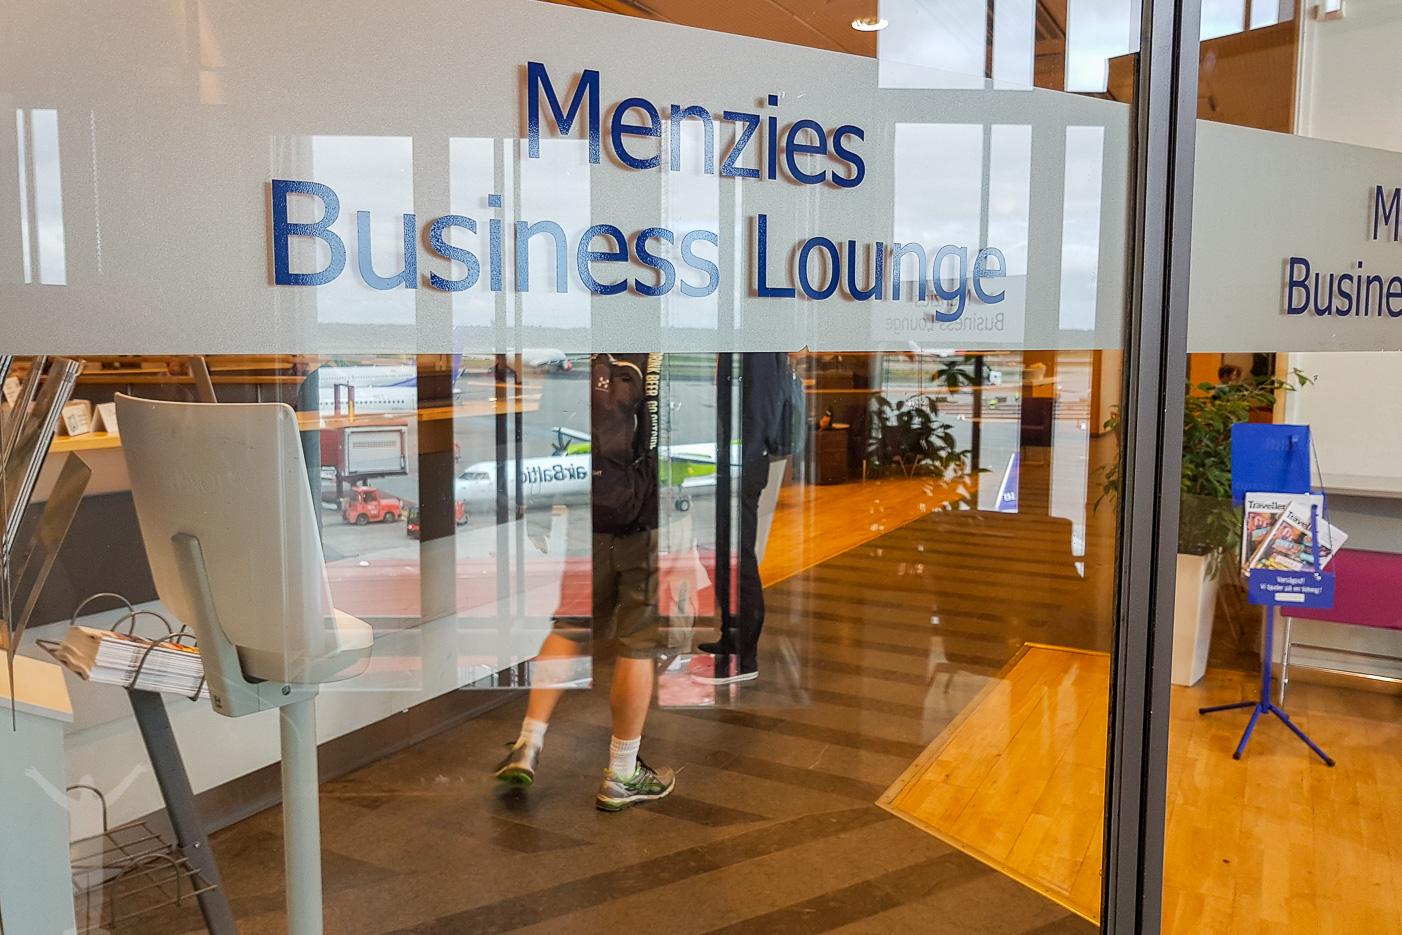 Menzies Business Lounge på Arlanda